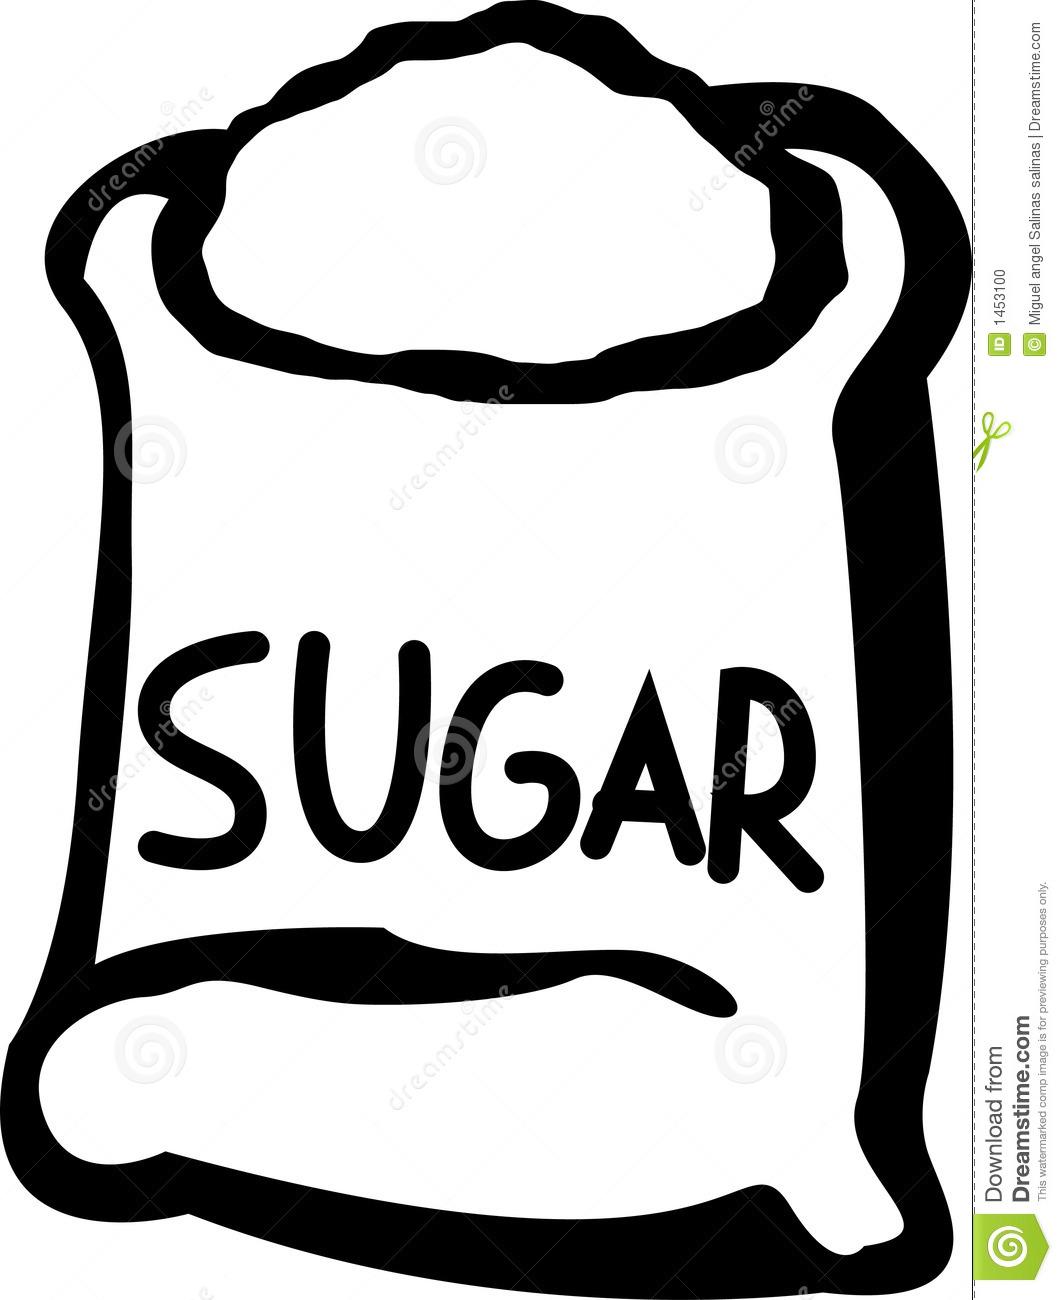 Azucar clipart Free Images Art sugar%20clipart Panda